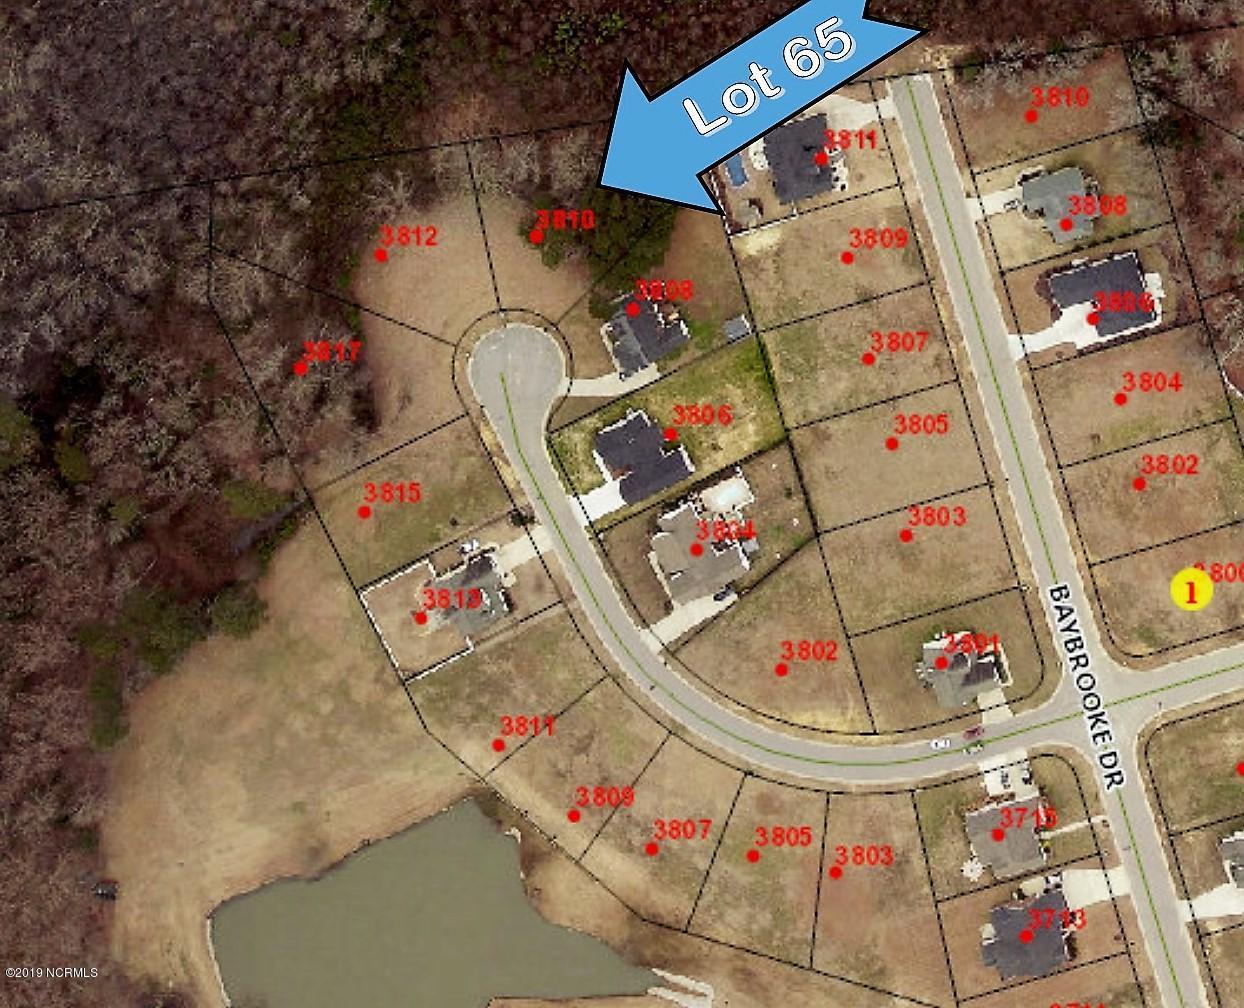 3810 Ramblewood Hill Drive, Wilson, North Carolina 27893, ,Retail,For sale,Ramblewood Hill,100193447